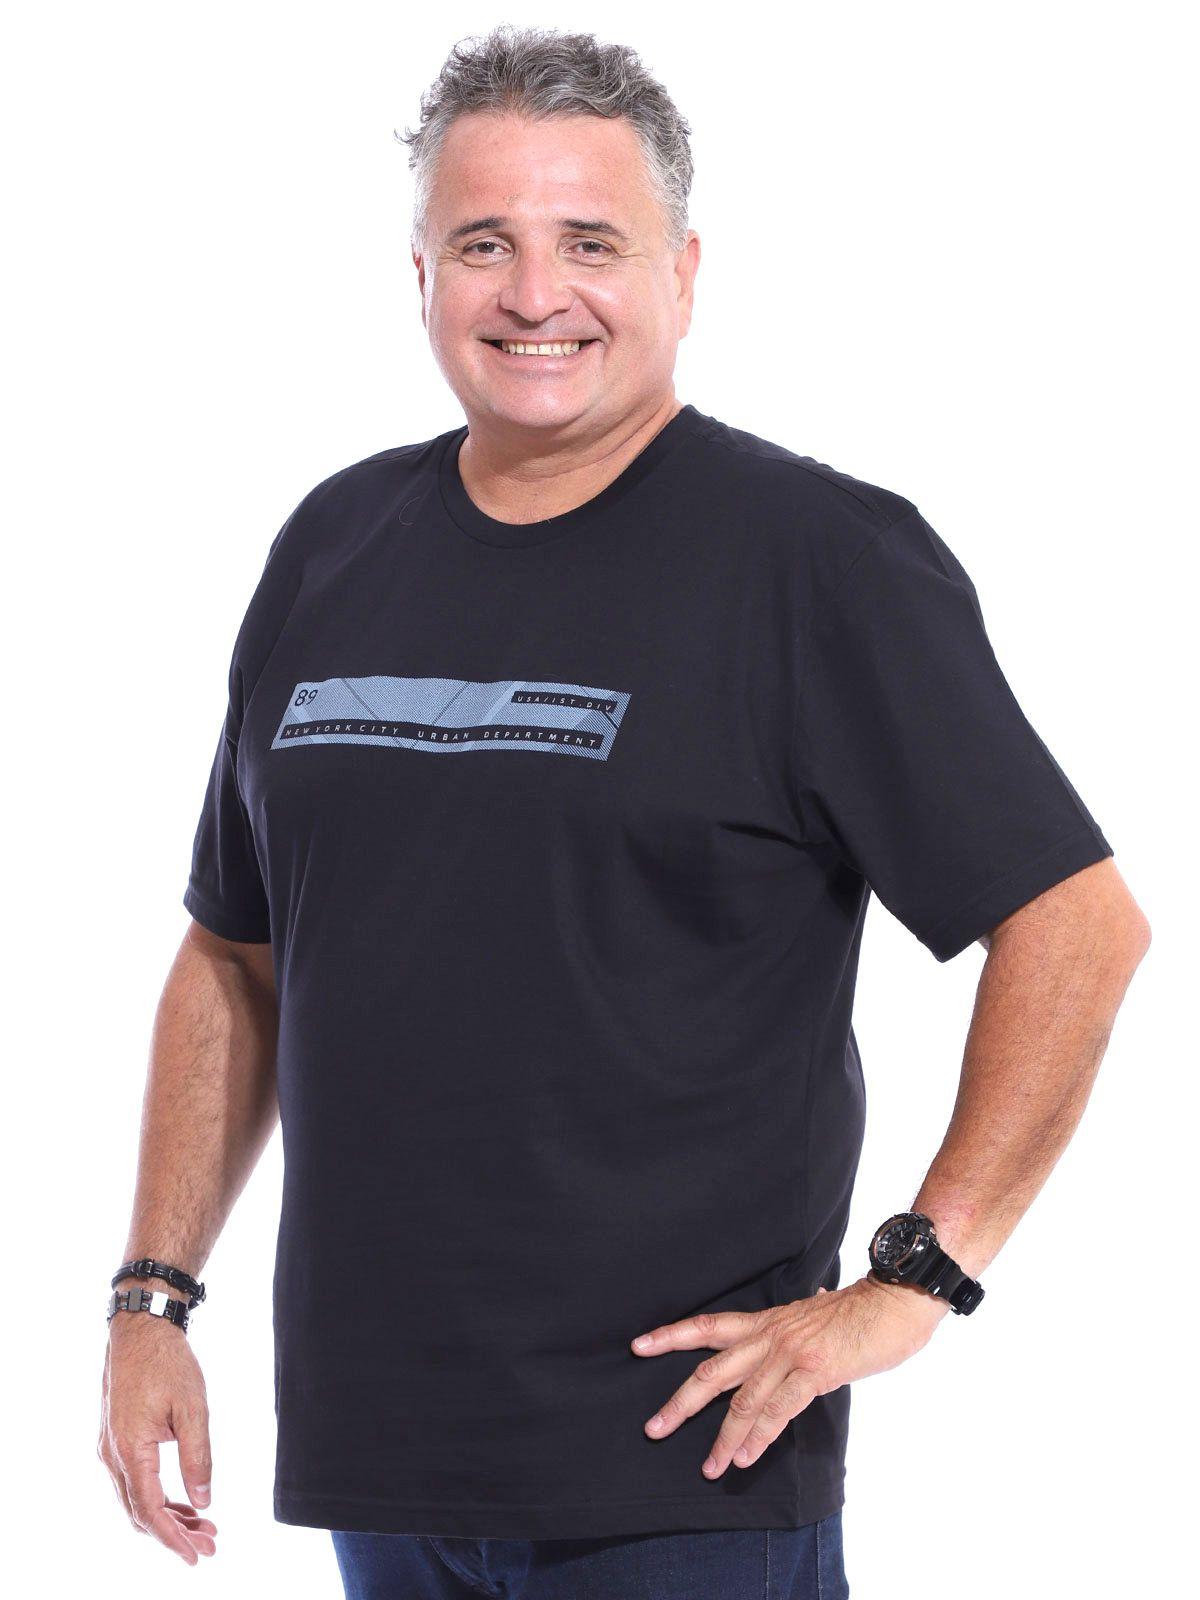 Camiseta Plus Size Masculina Manga Curta Estampa Front Preto